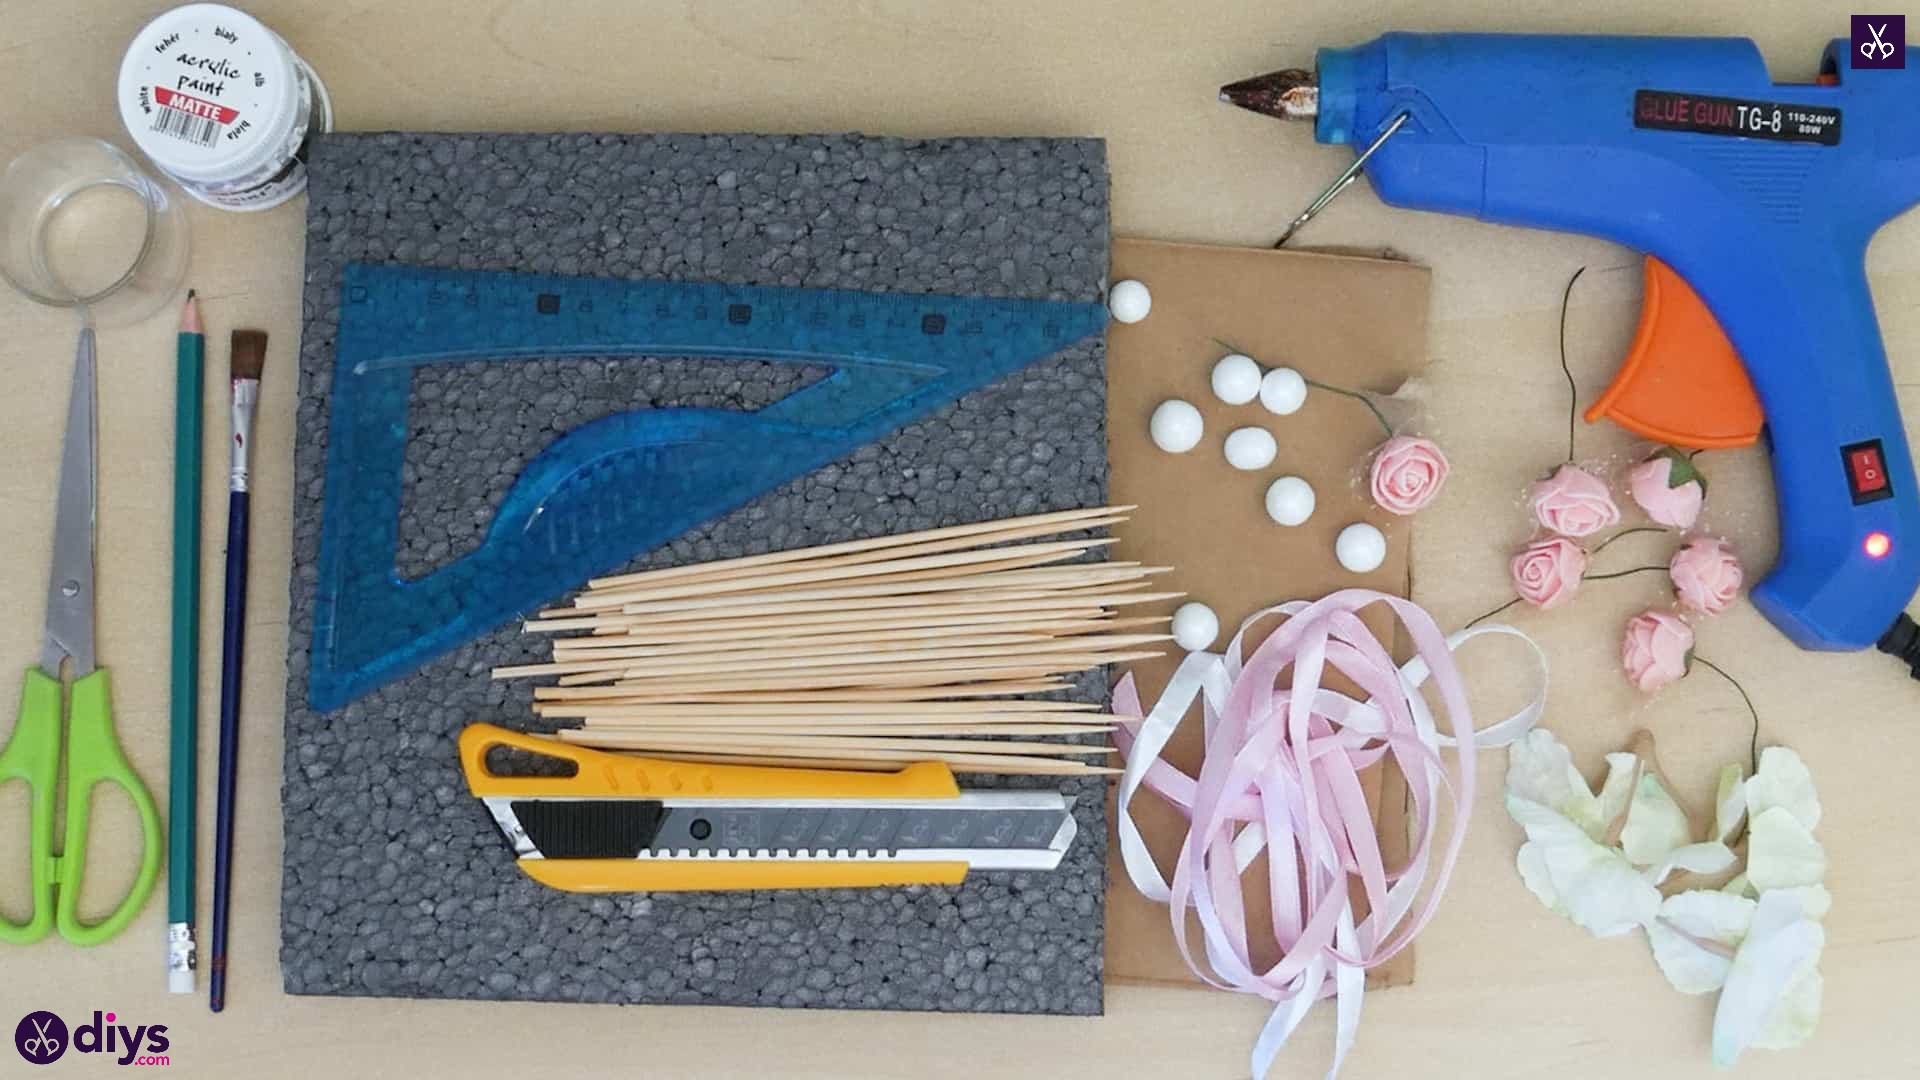 Diy miniature cage centerpiece materials